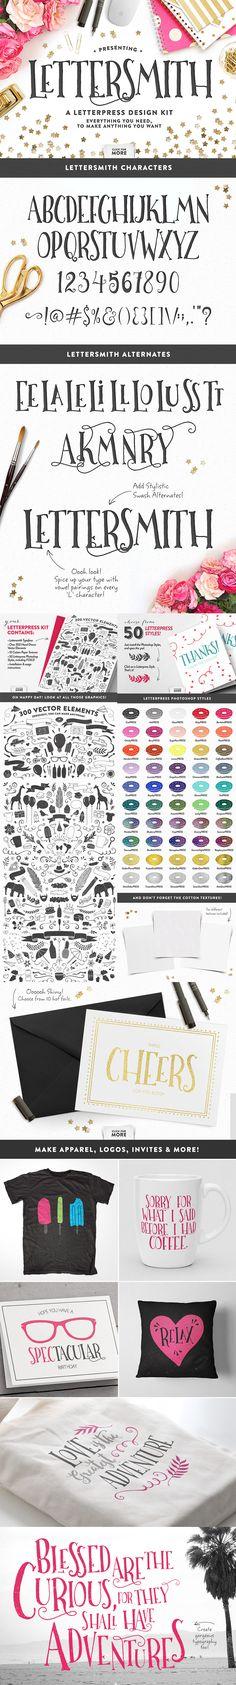 Lettersmith - Letterpress Design Kit by Make Media Co   22 Professional & Artistic Fonts Apr 2015